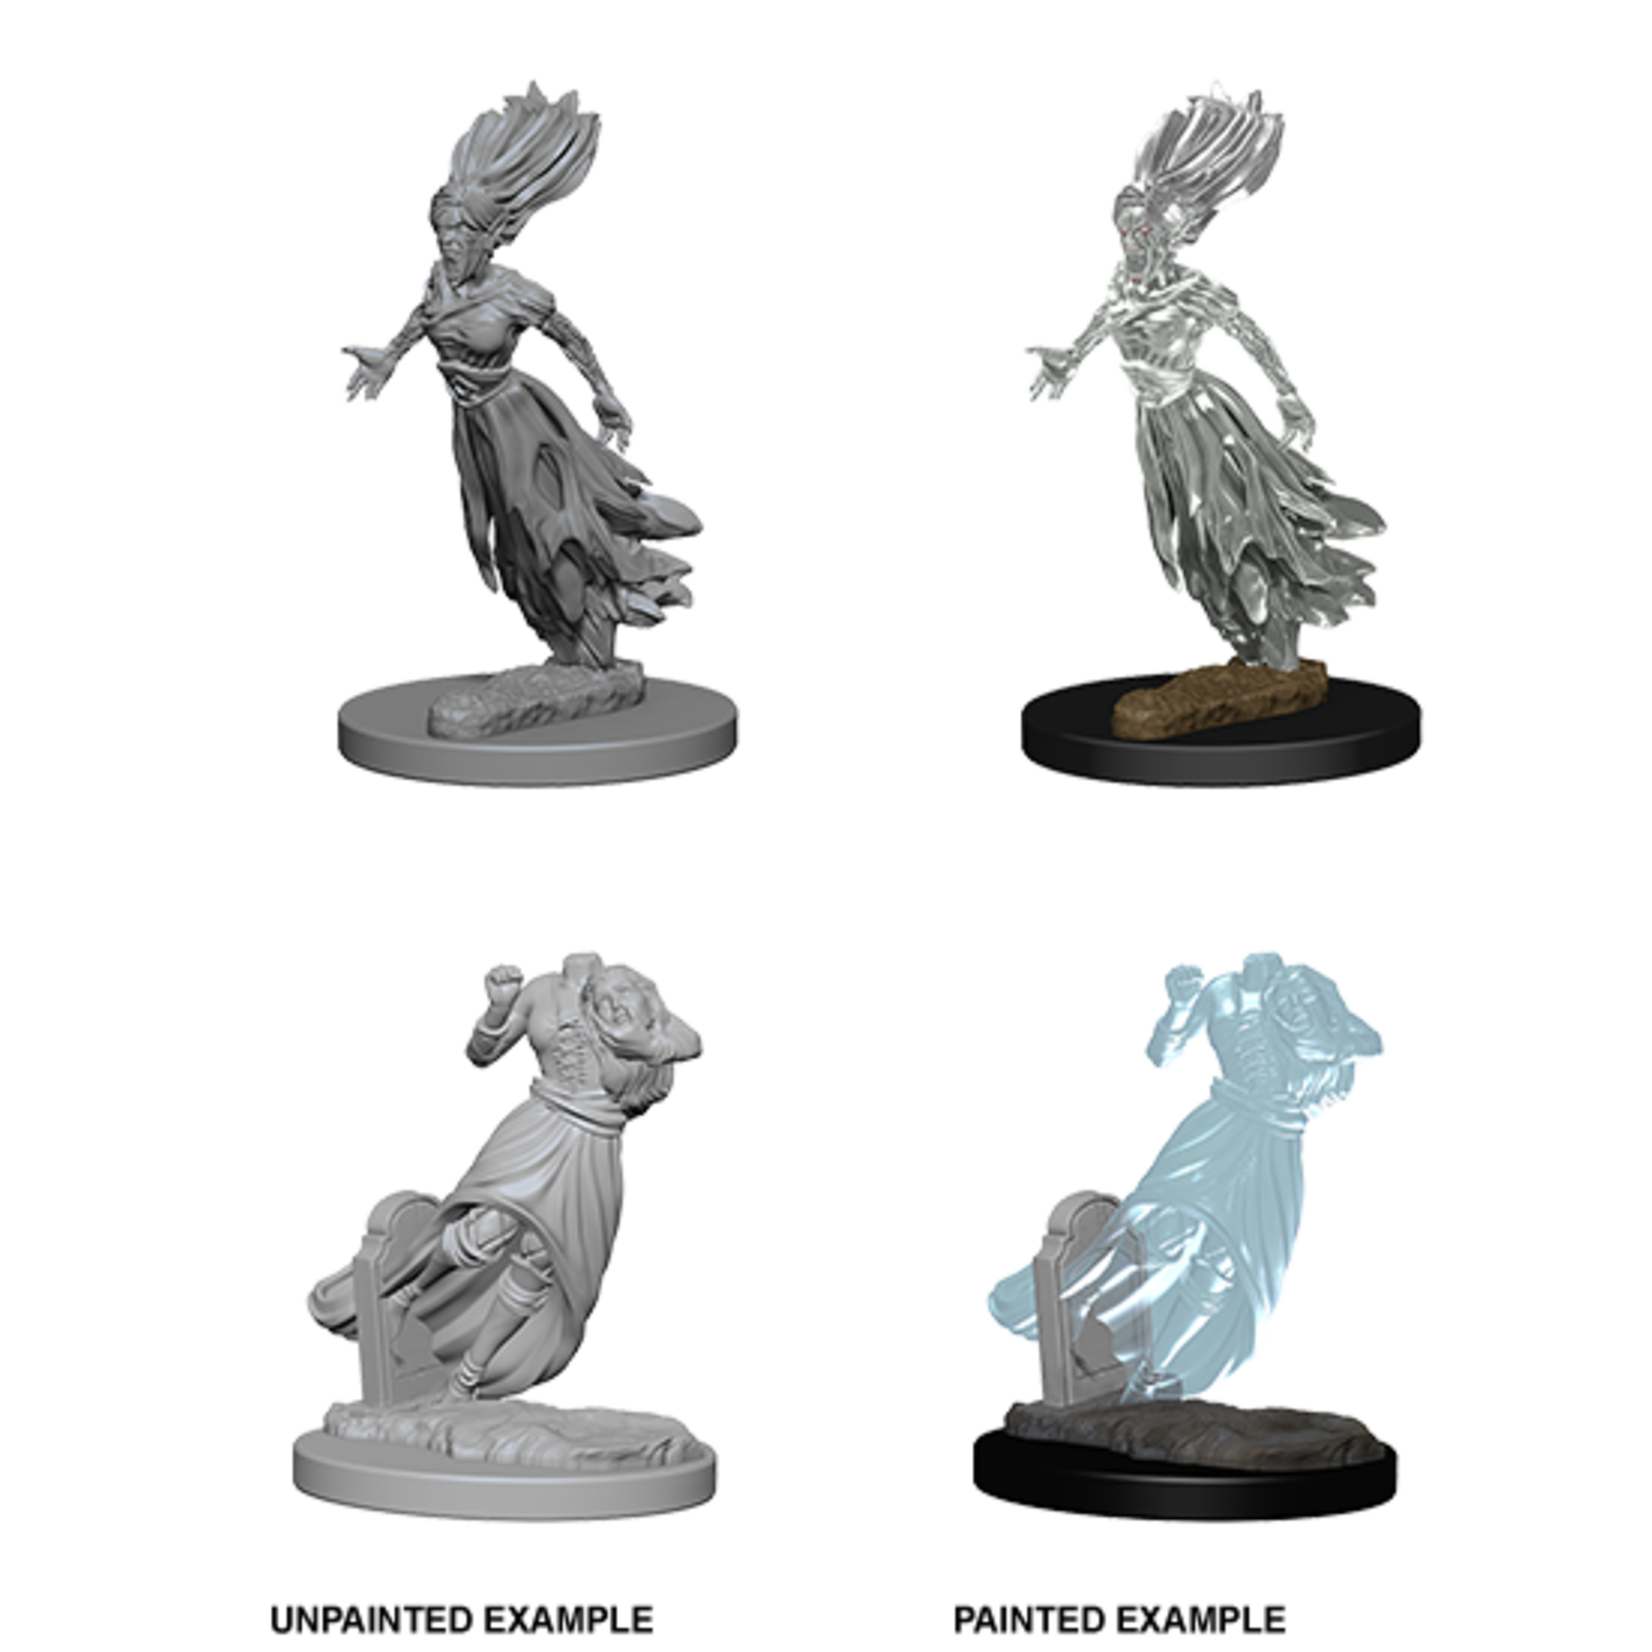 WizKids Dungeons & Dragons Nolzur`s Marvelous Unpainted Miniatures: W1 Ghosts